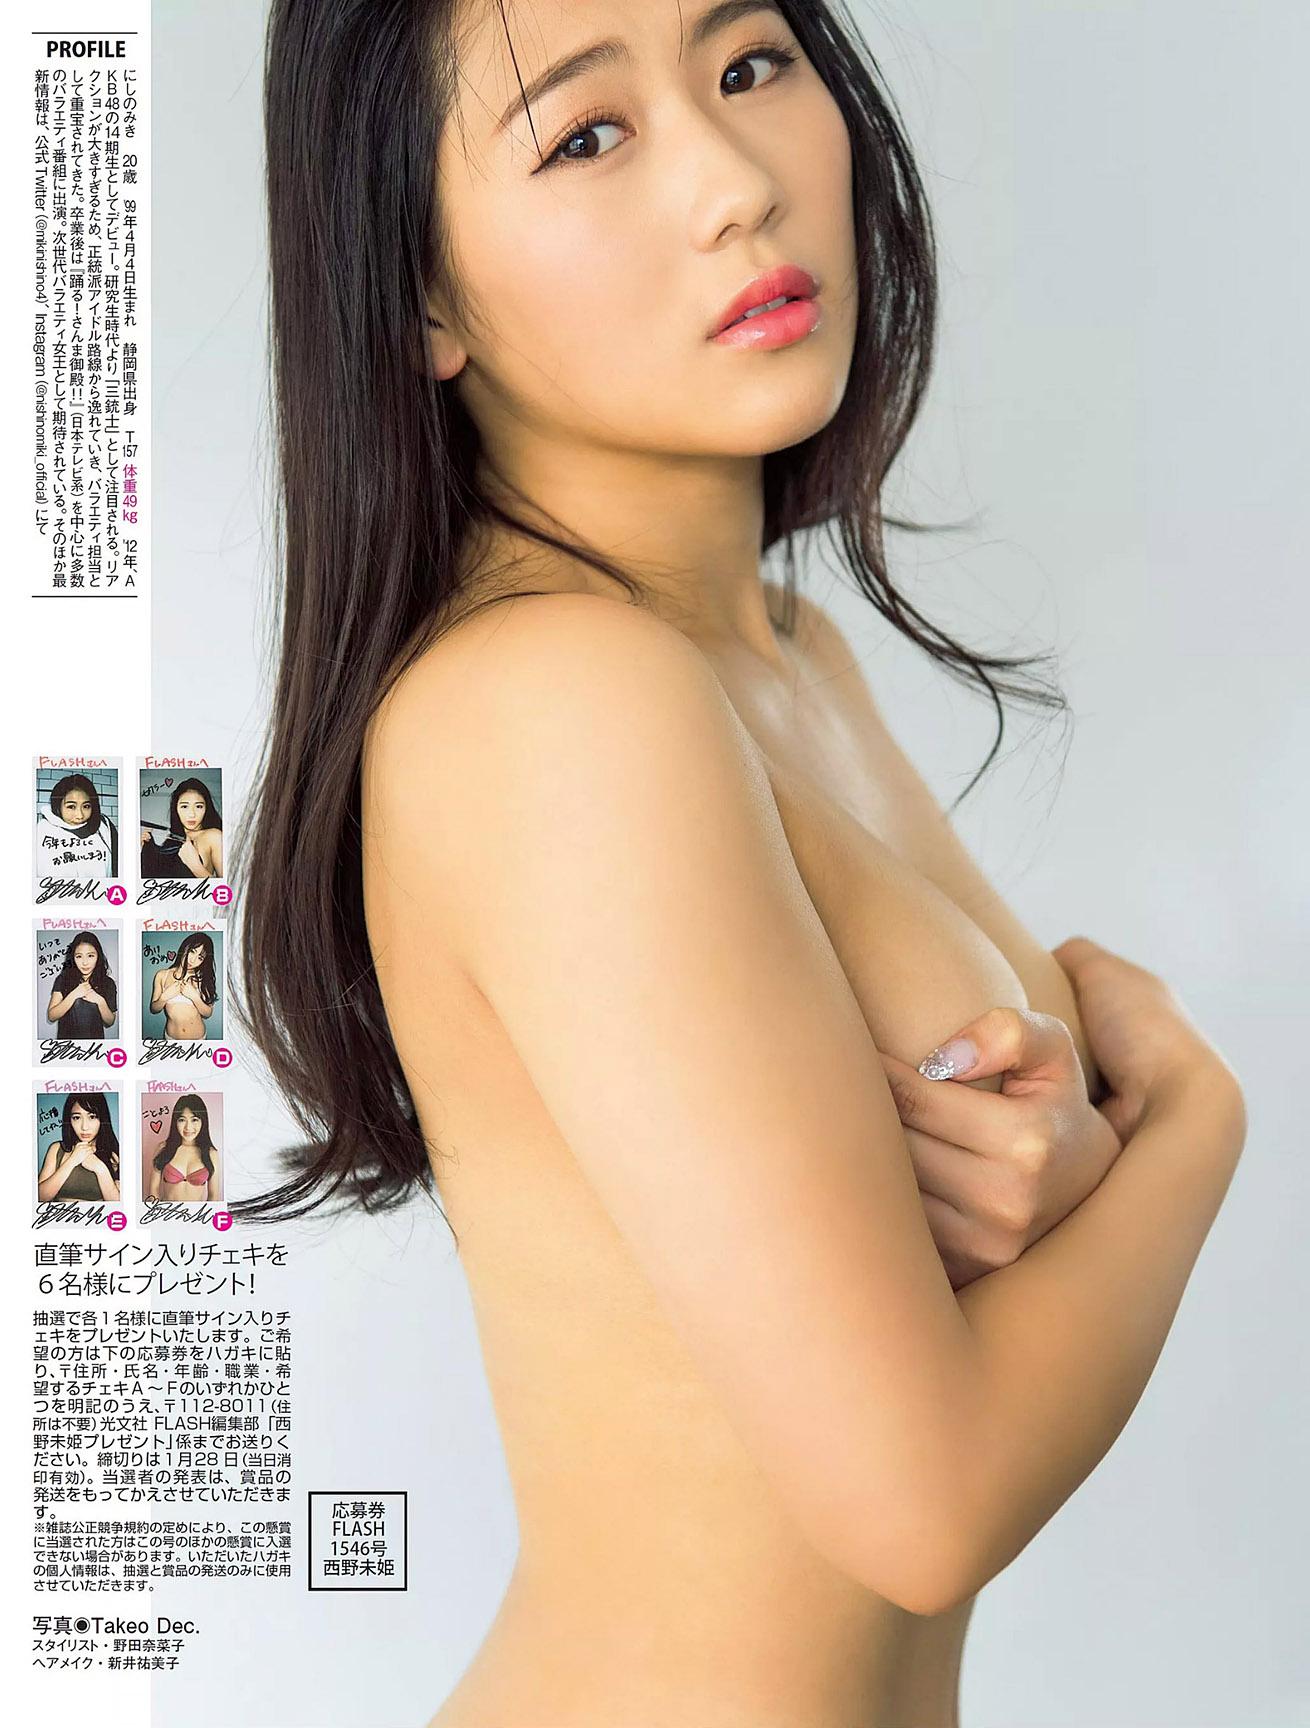 Miki Nishino Flash 200204 04.jpg